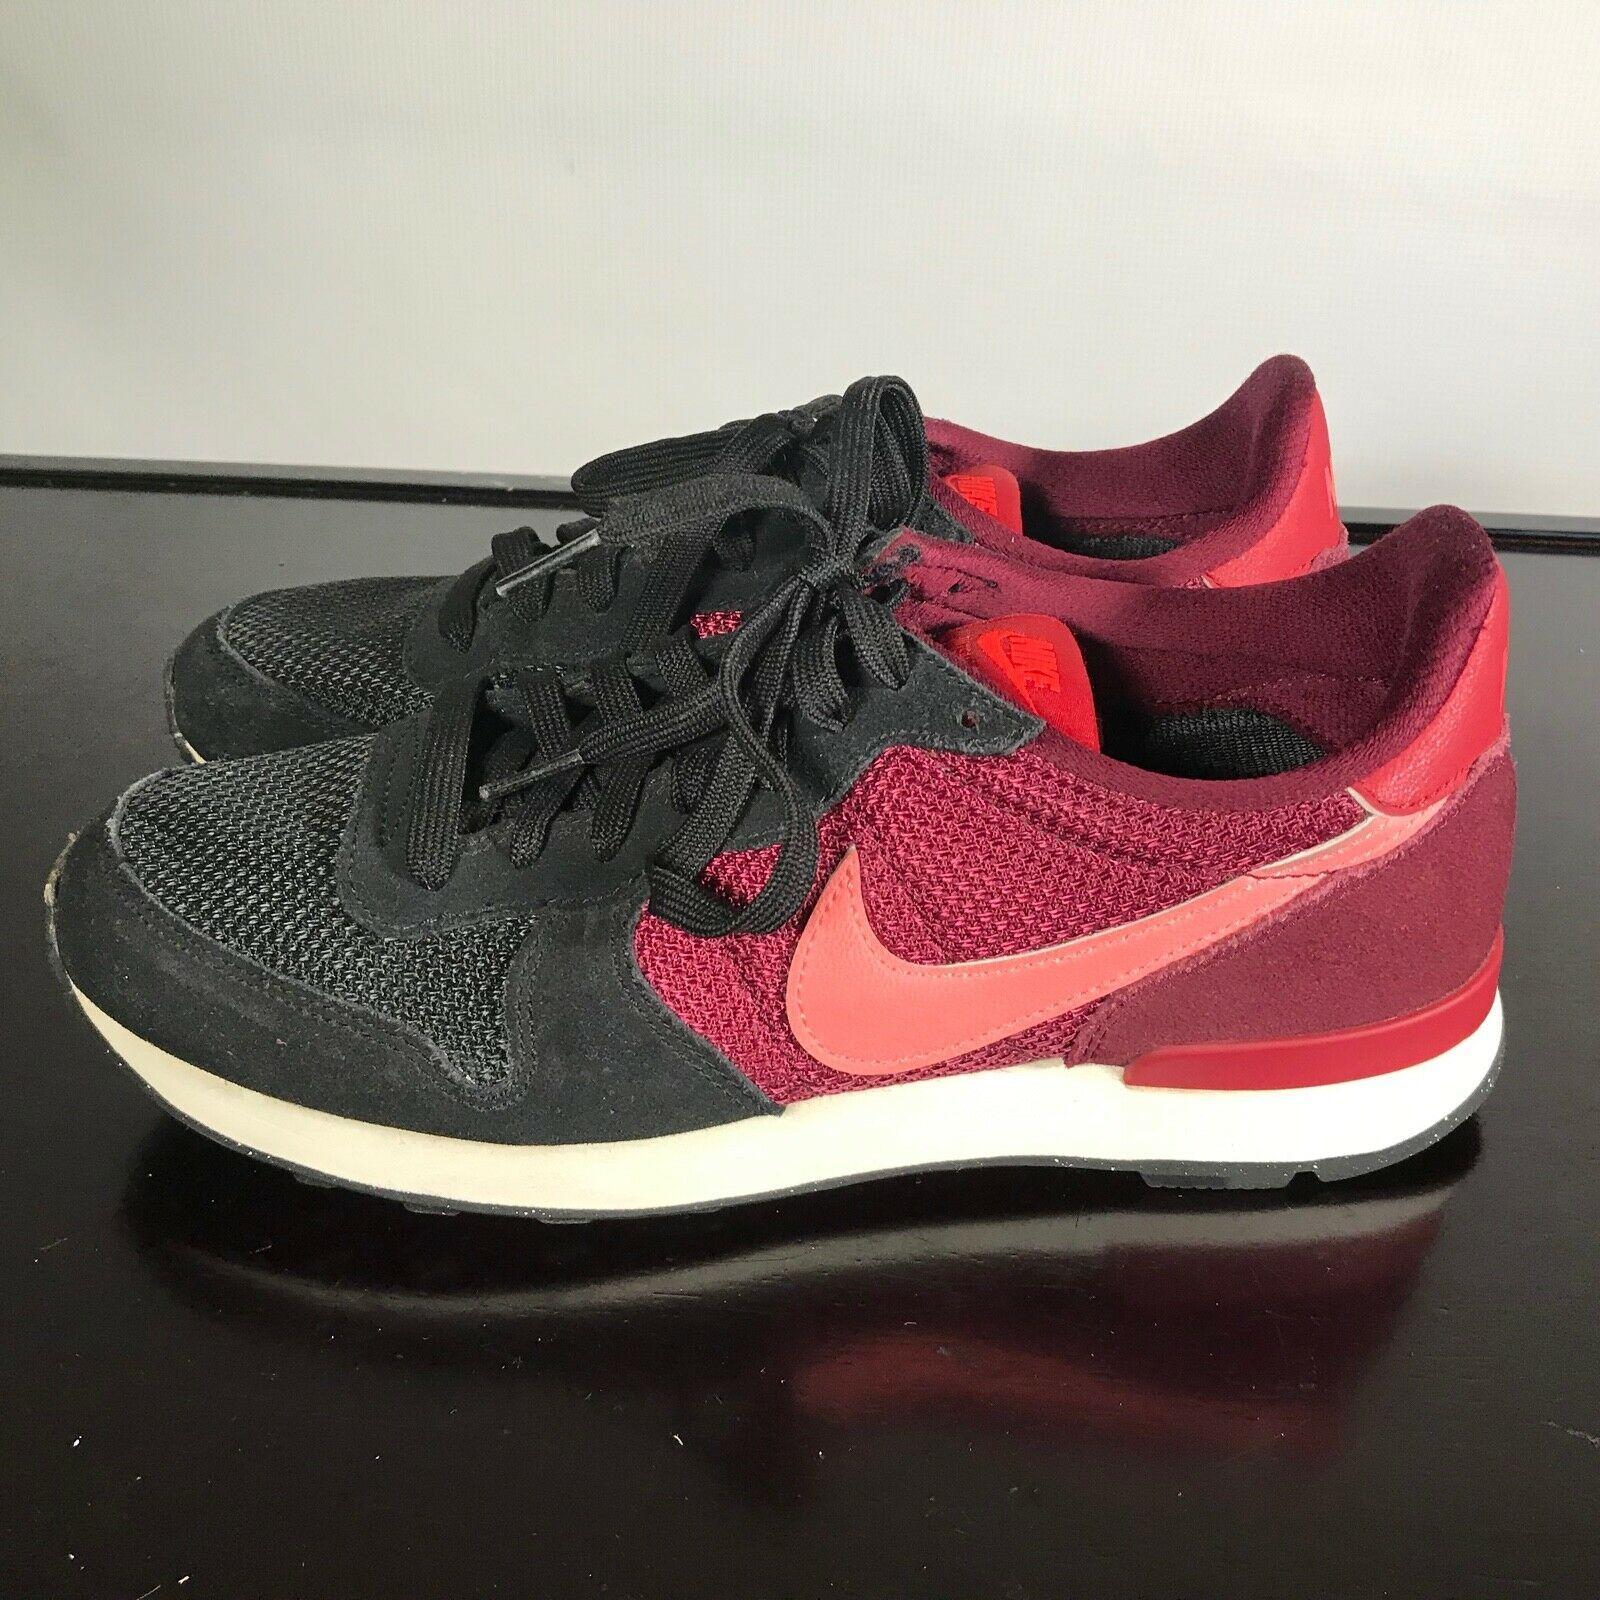 Nike Internationalist Sz 8.5  Suede & Mesh Athletic Sneaker Women's Shoes